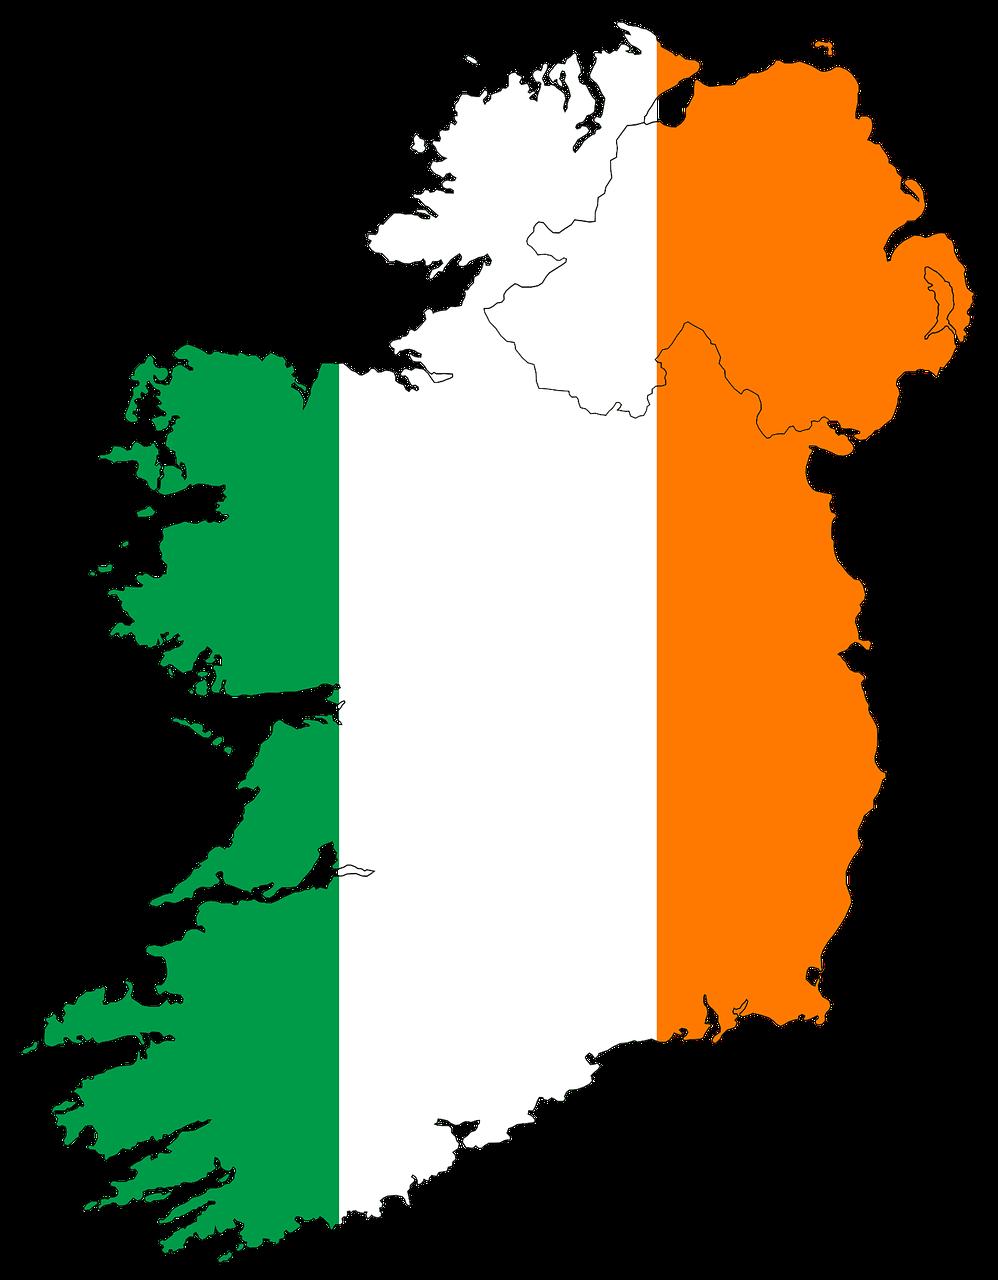 Irlande Mobilité